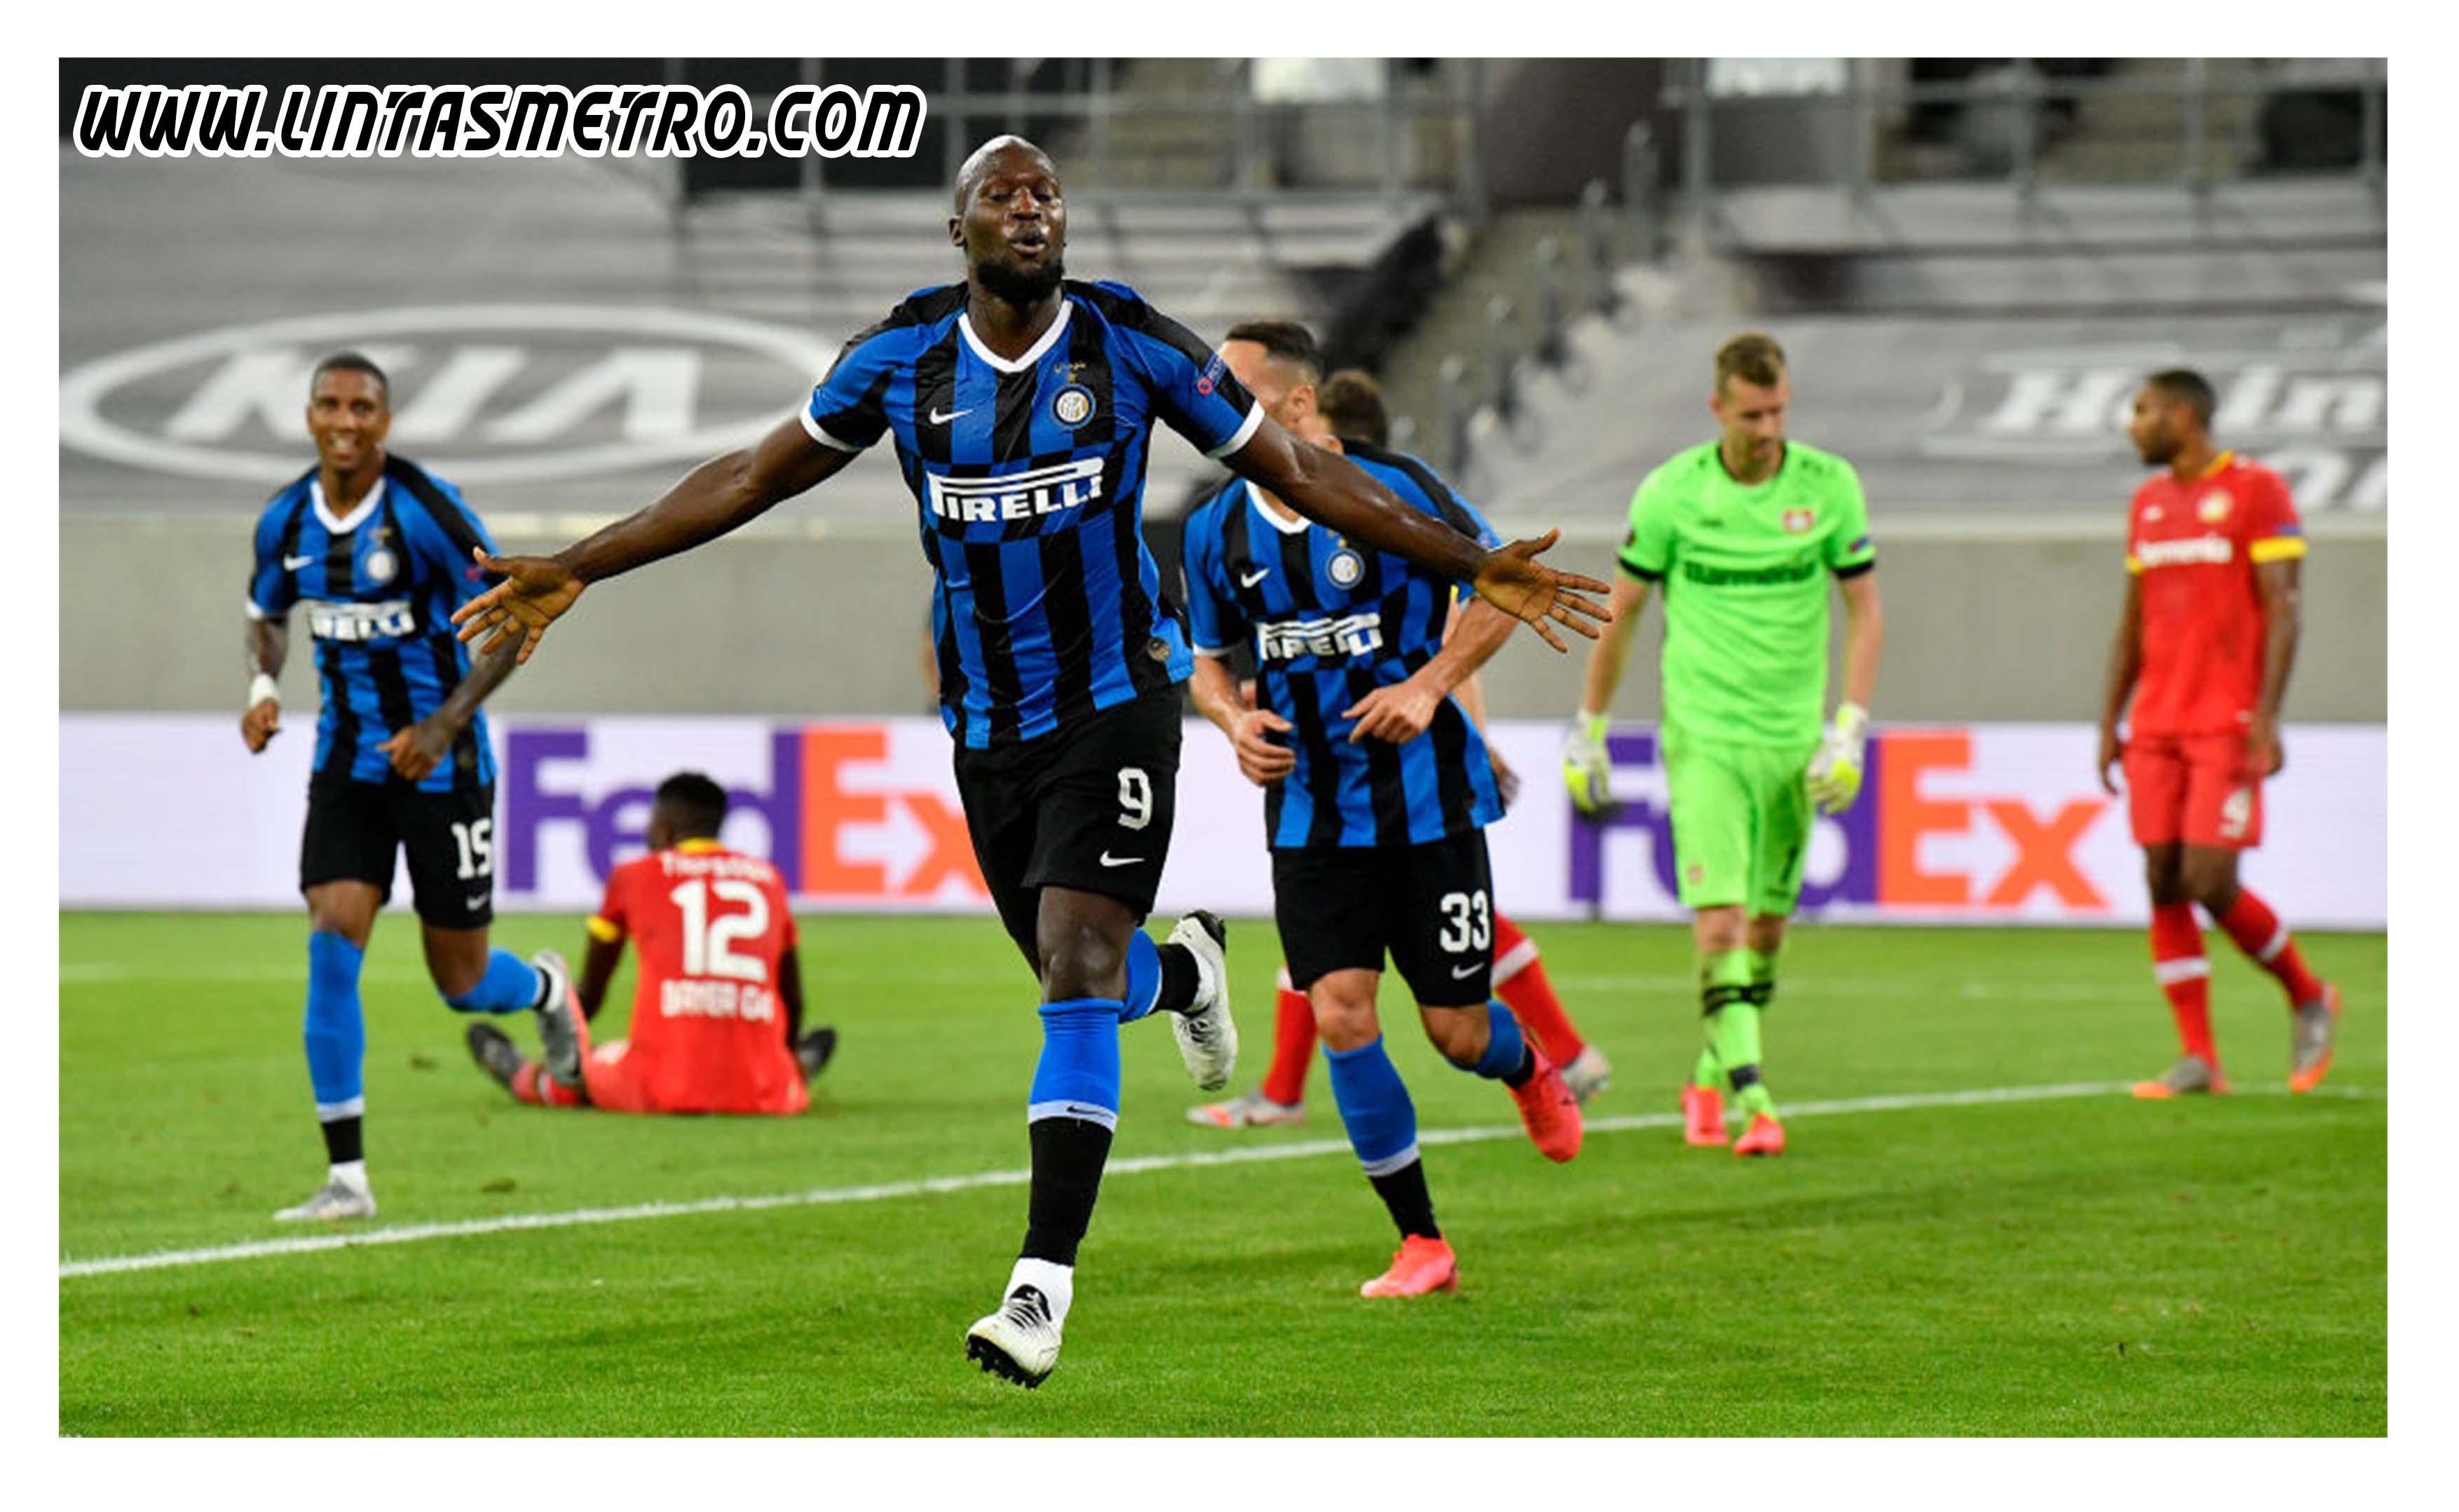 Inter Milan vs Shakhtar Donetsk Prediksi Liga Champions 2020/21